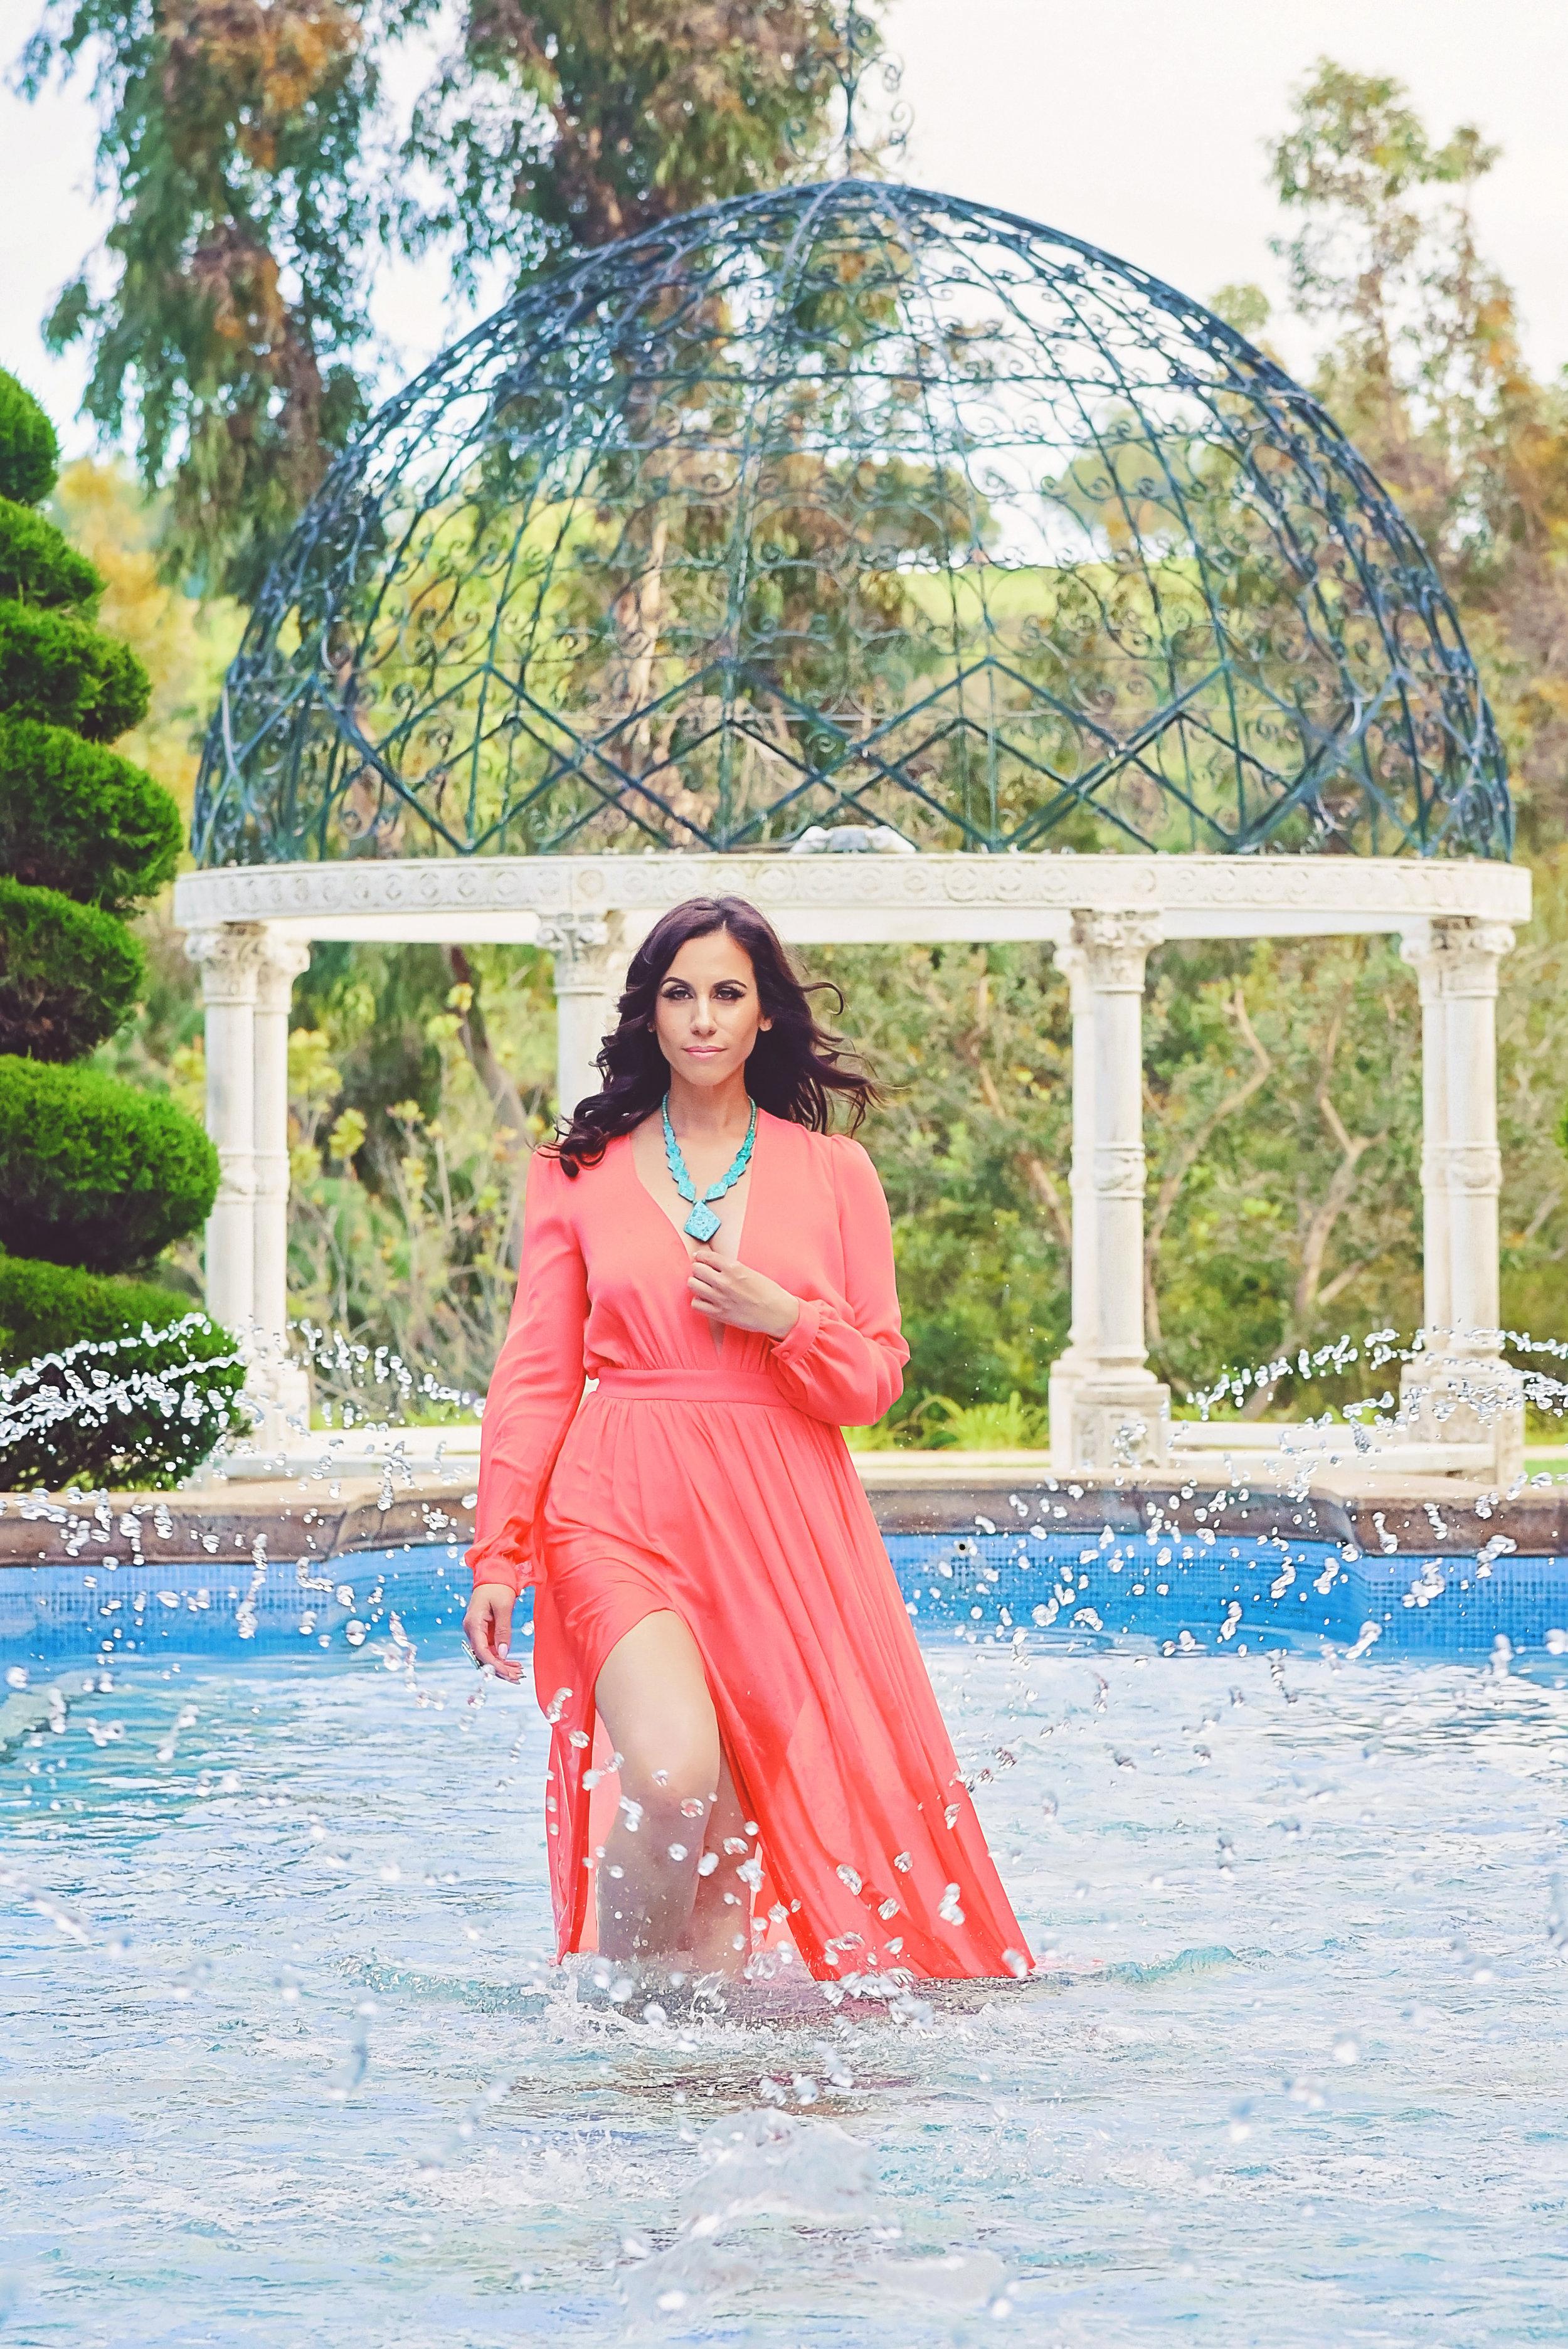 Fashion Coral Dress Aqua Necklace | Fashion Photography | Lacey O | Washington DC